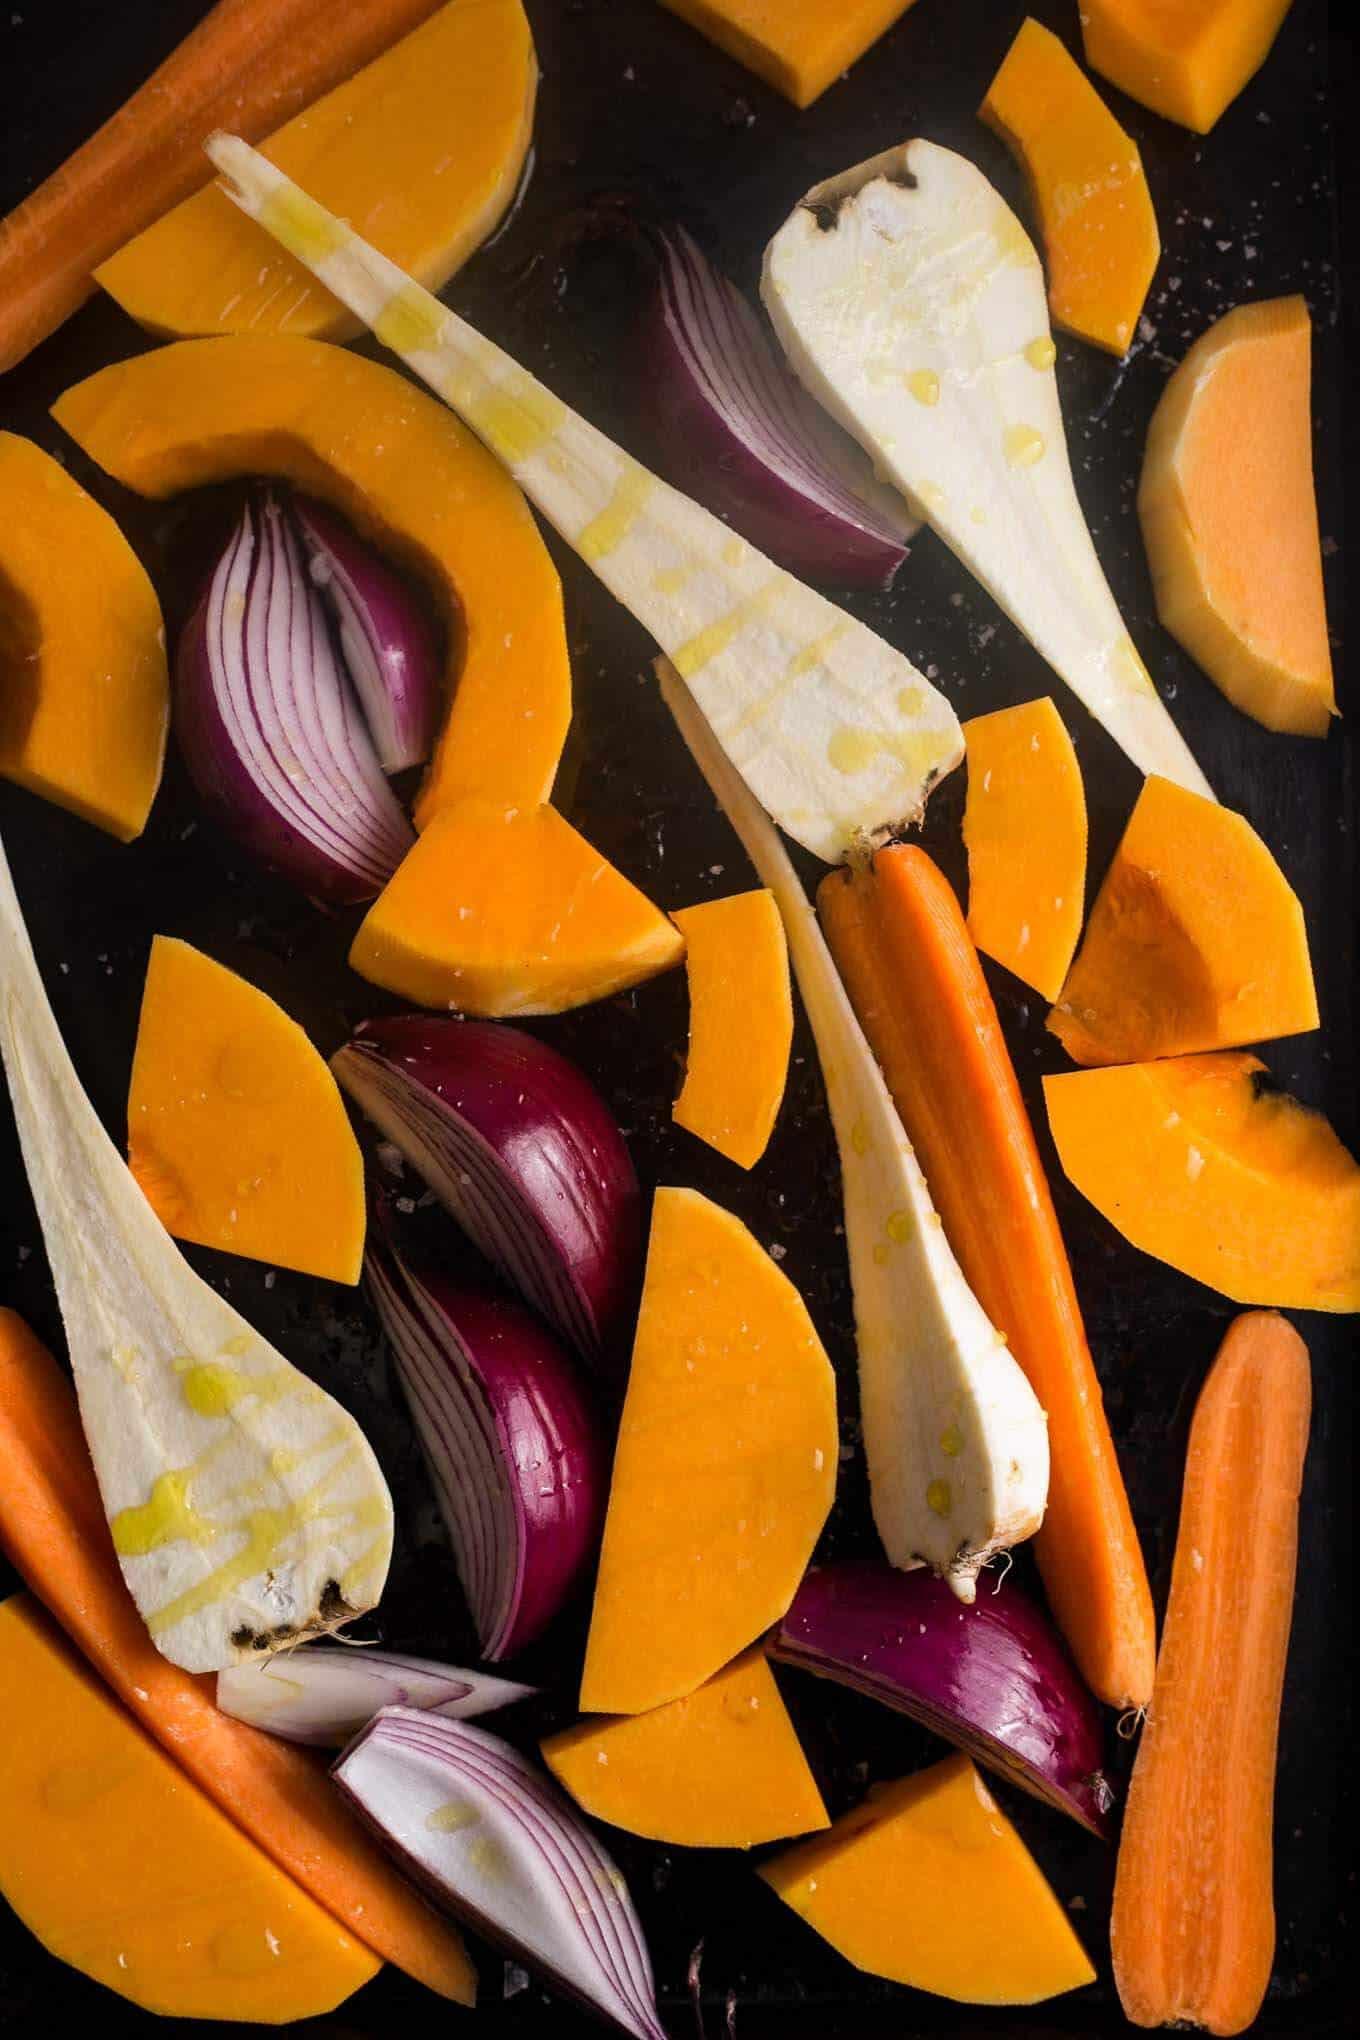 Goyoza dumplings with #pumpkin and root vegetables filling #vegan | via @annabanana.co